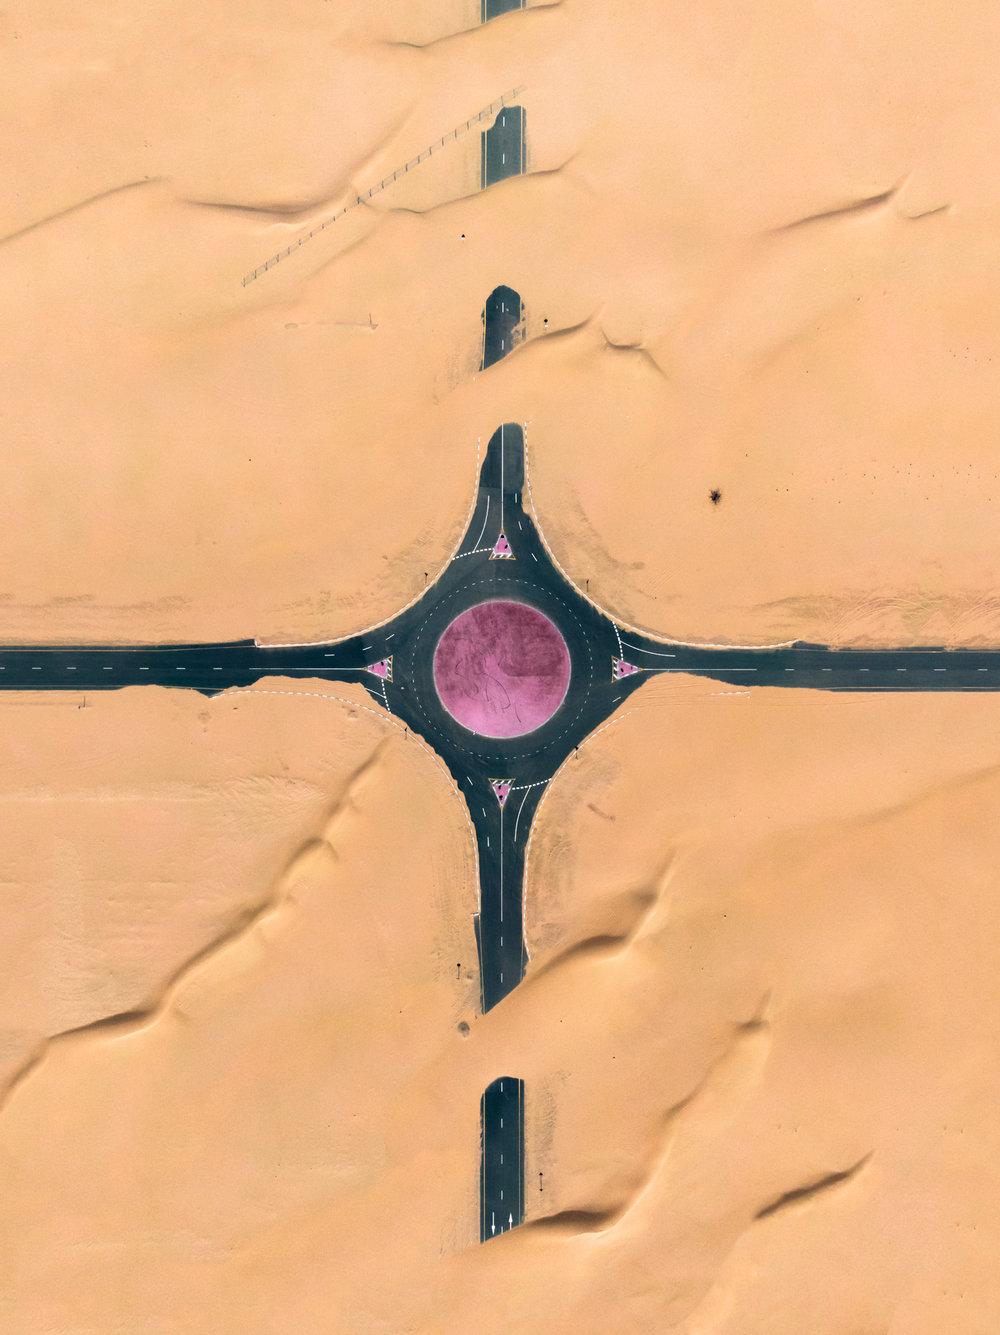 circleinthedesert_typoland_aerial.jpg